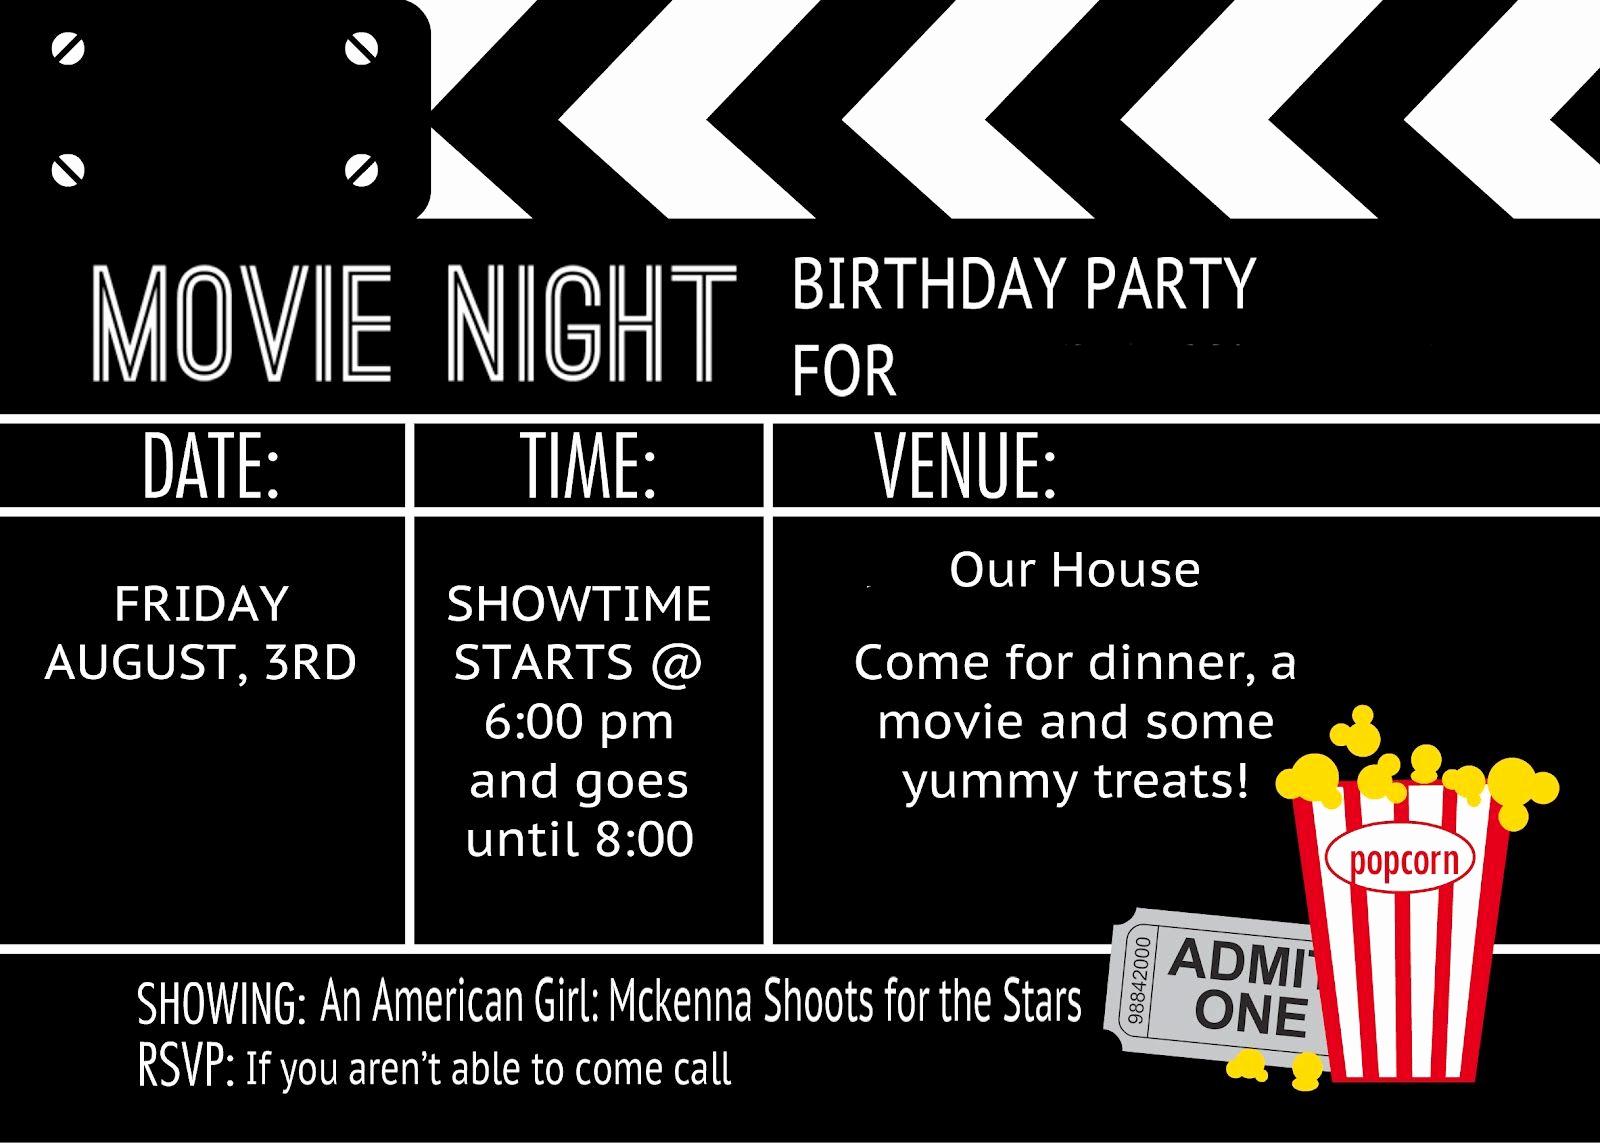 Printable Movie Ticket Invitation Elegant Cool Black and White Movie themed Birthday Party